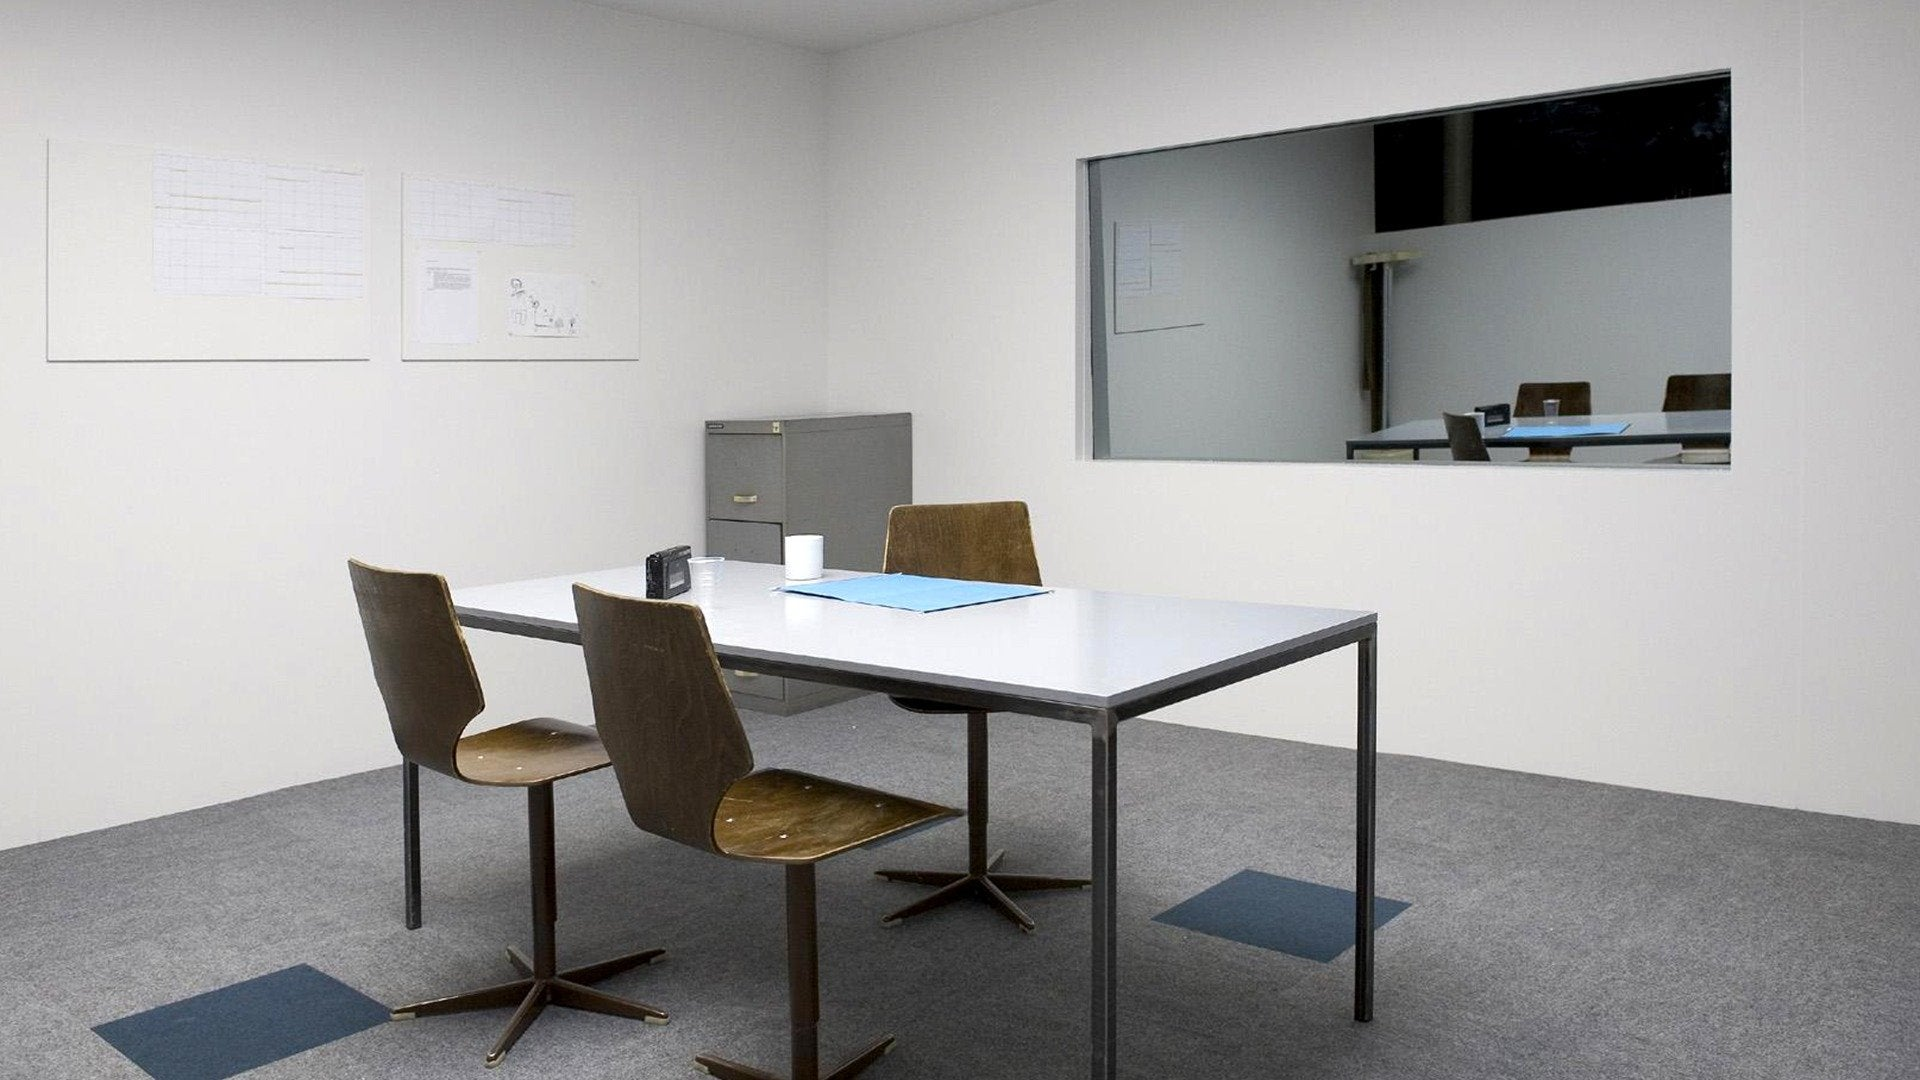 Secrets of Interrogation